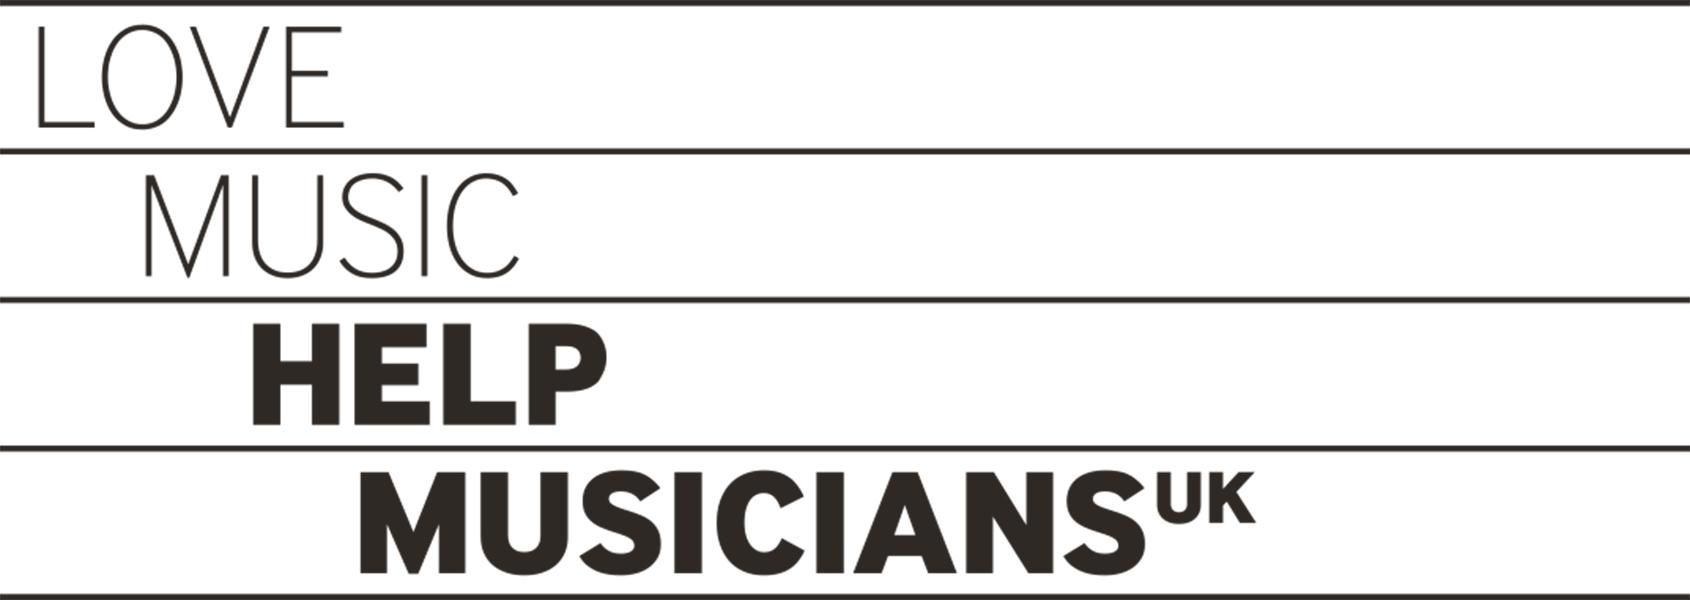 Love_Music_Help_Musicians_UK_logo_black_pantone_coated.jpg